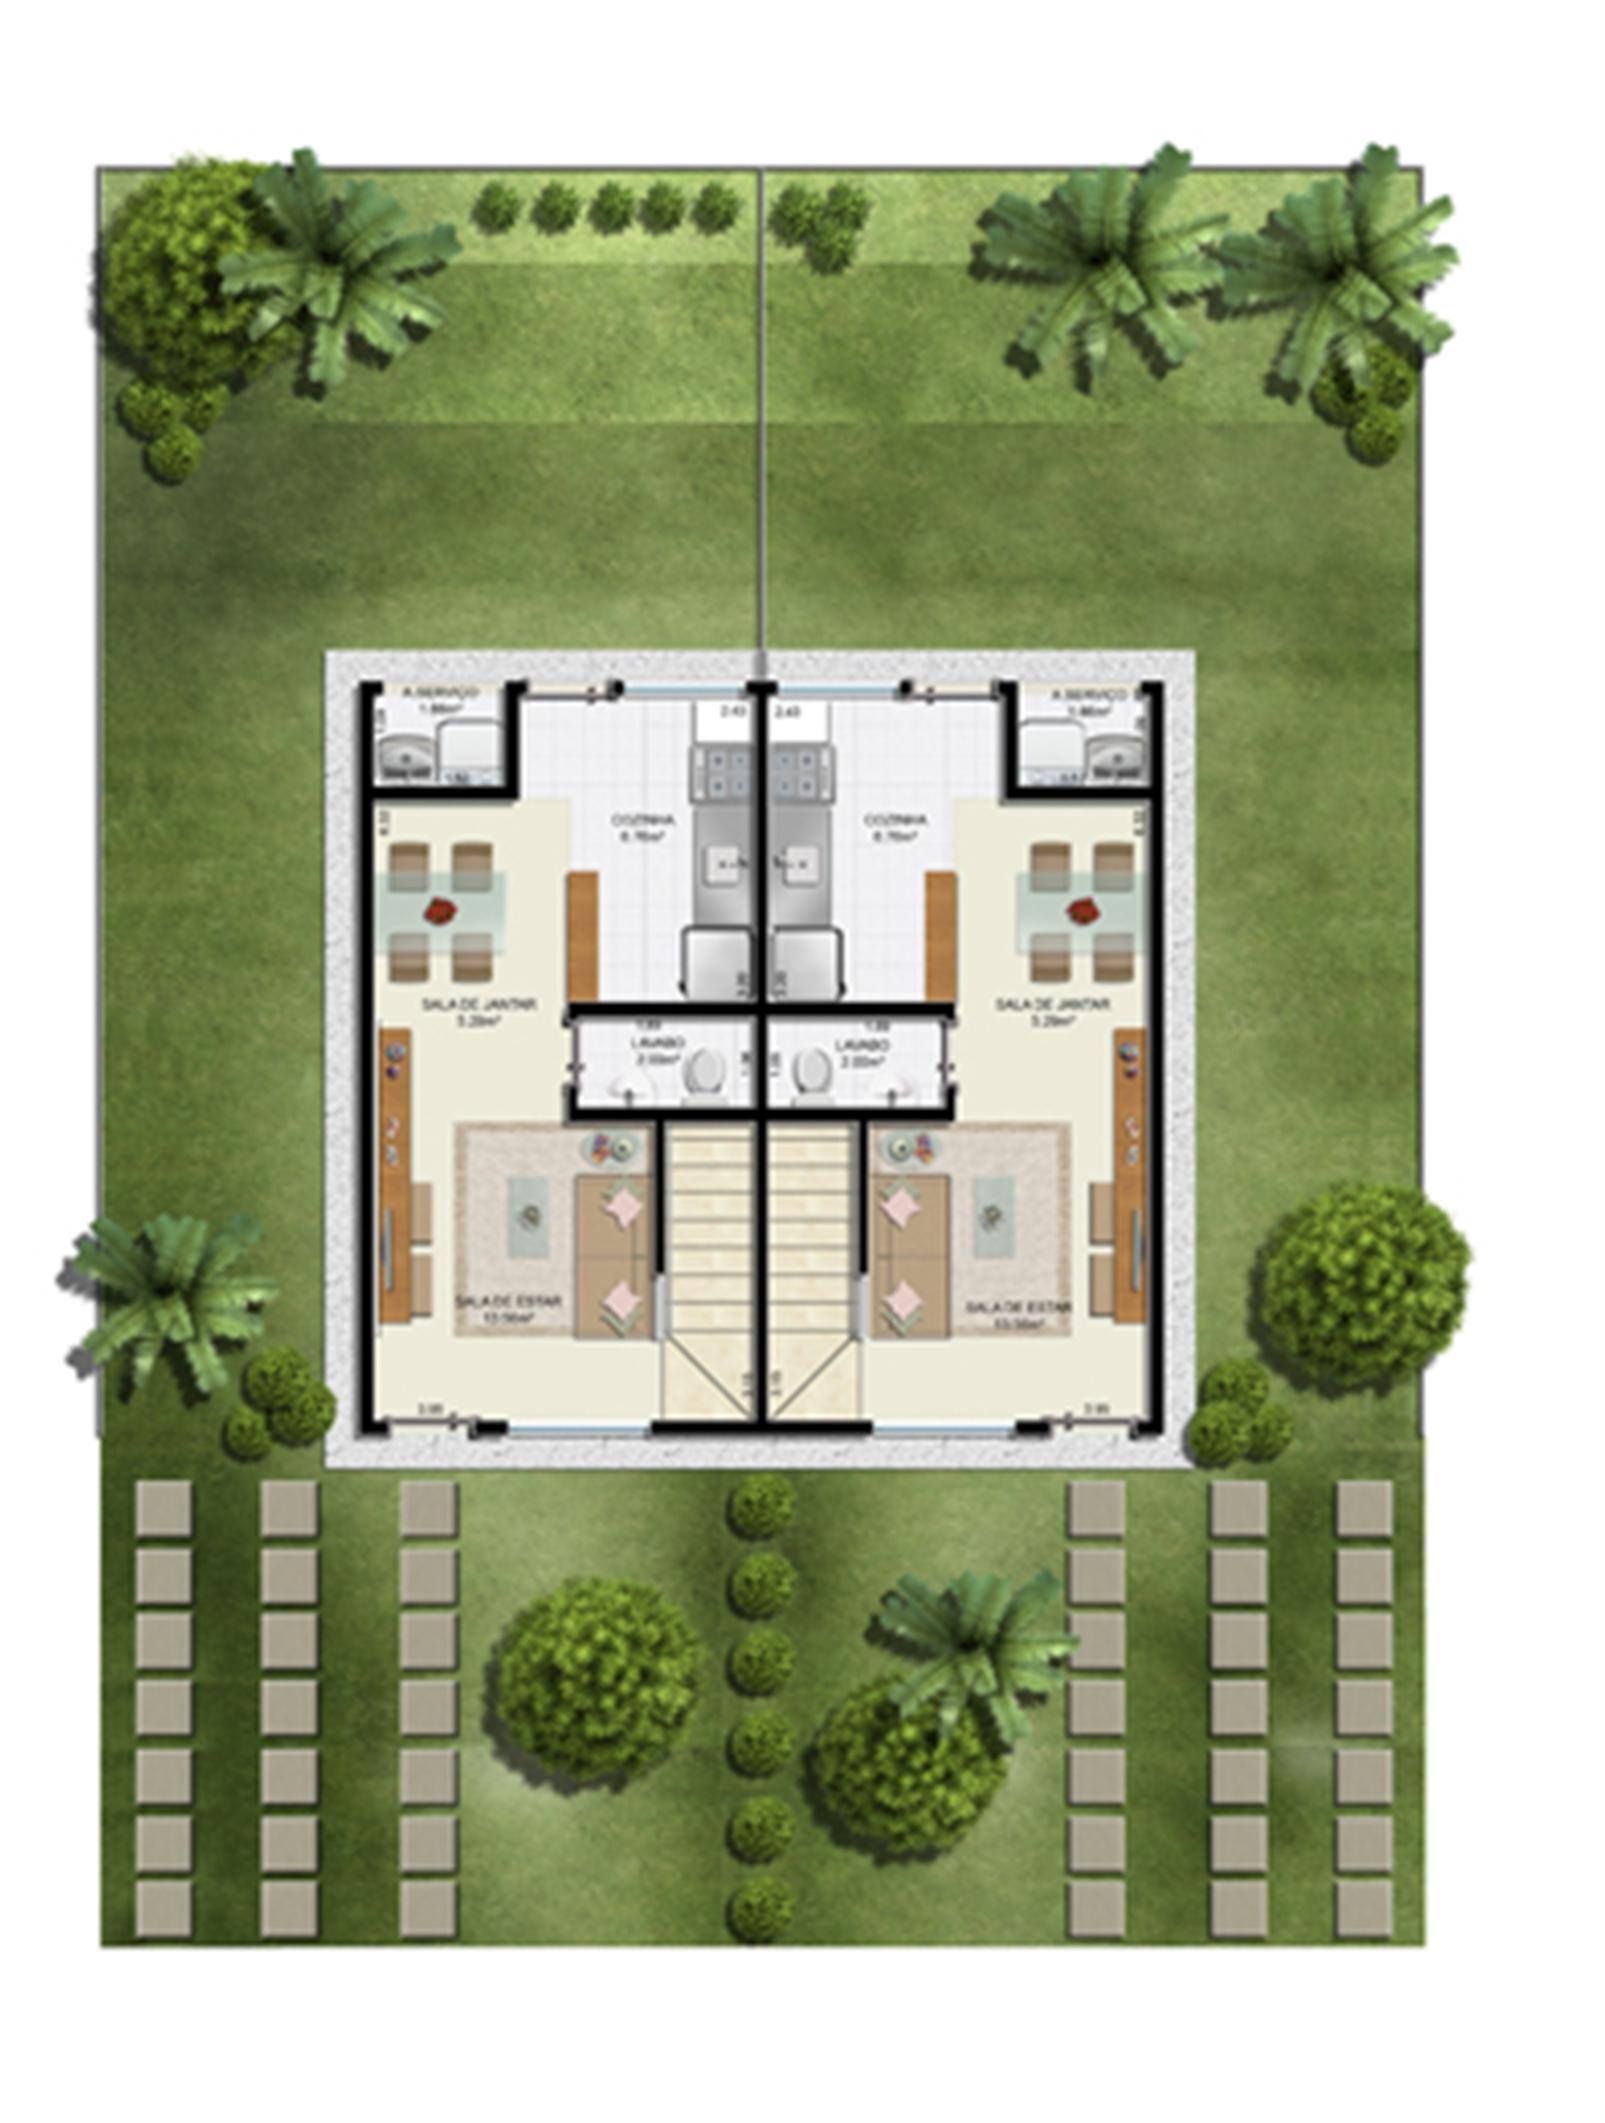 Planta 2 quartos - Térreo - 55 m² - Casa Dupla | Casas do Bosque – Casano  Cají - Lauro de Freitas - Bahia